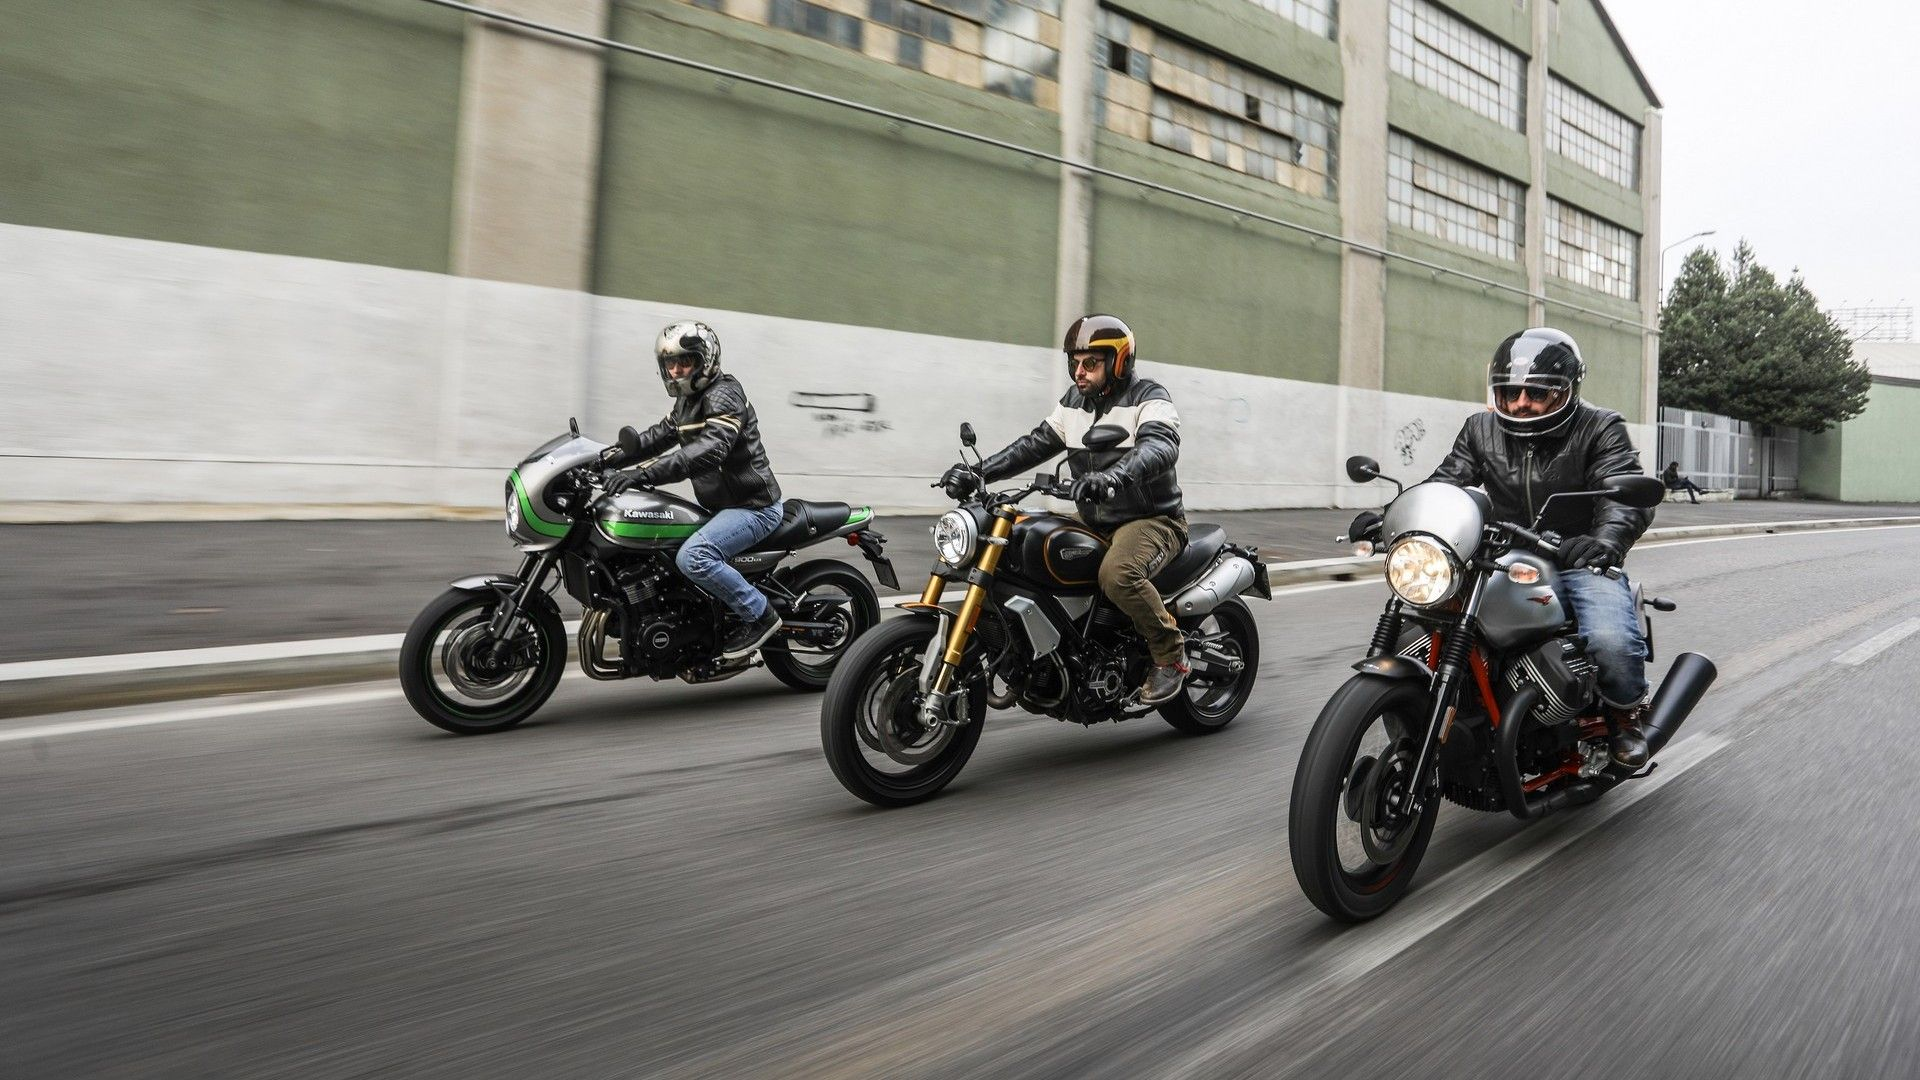 Prova Kawasaki Z900 Rs Cafe Ducati Scrambler 1100 Guzzi V7 Iii